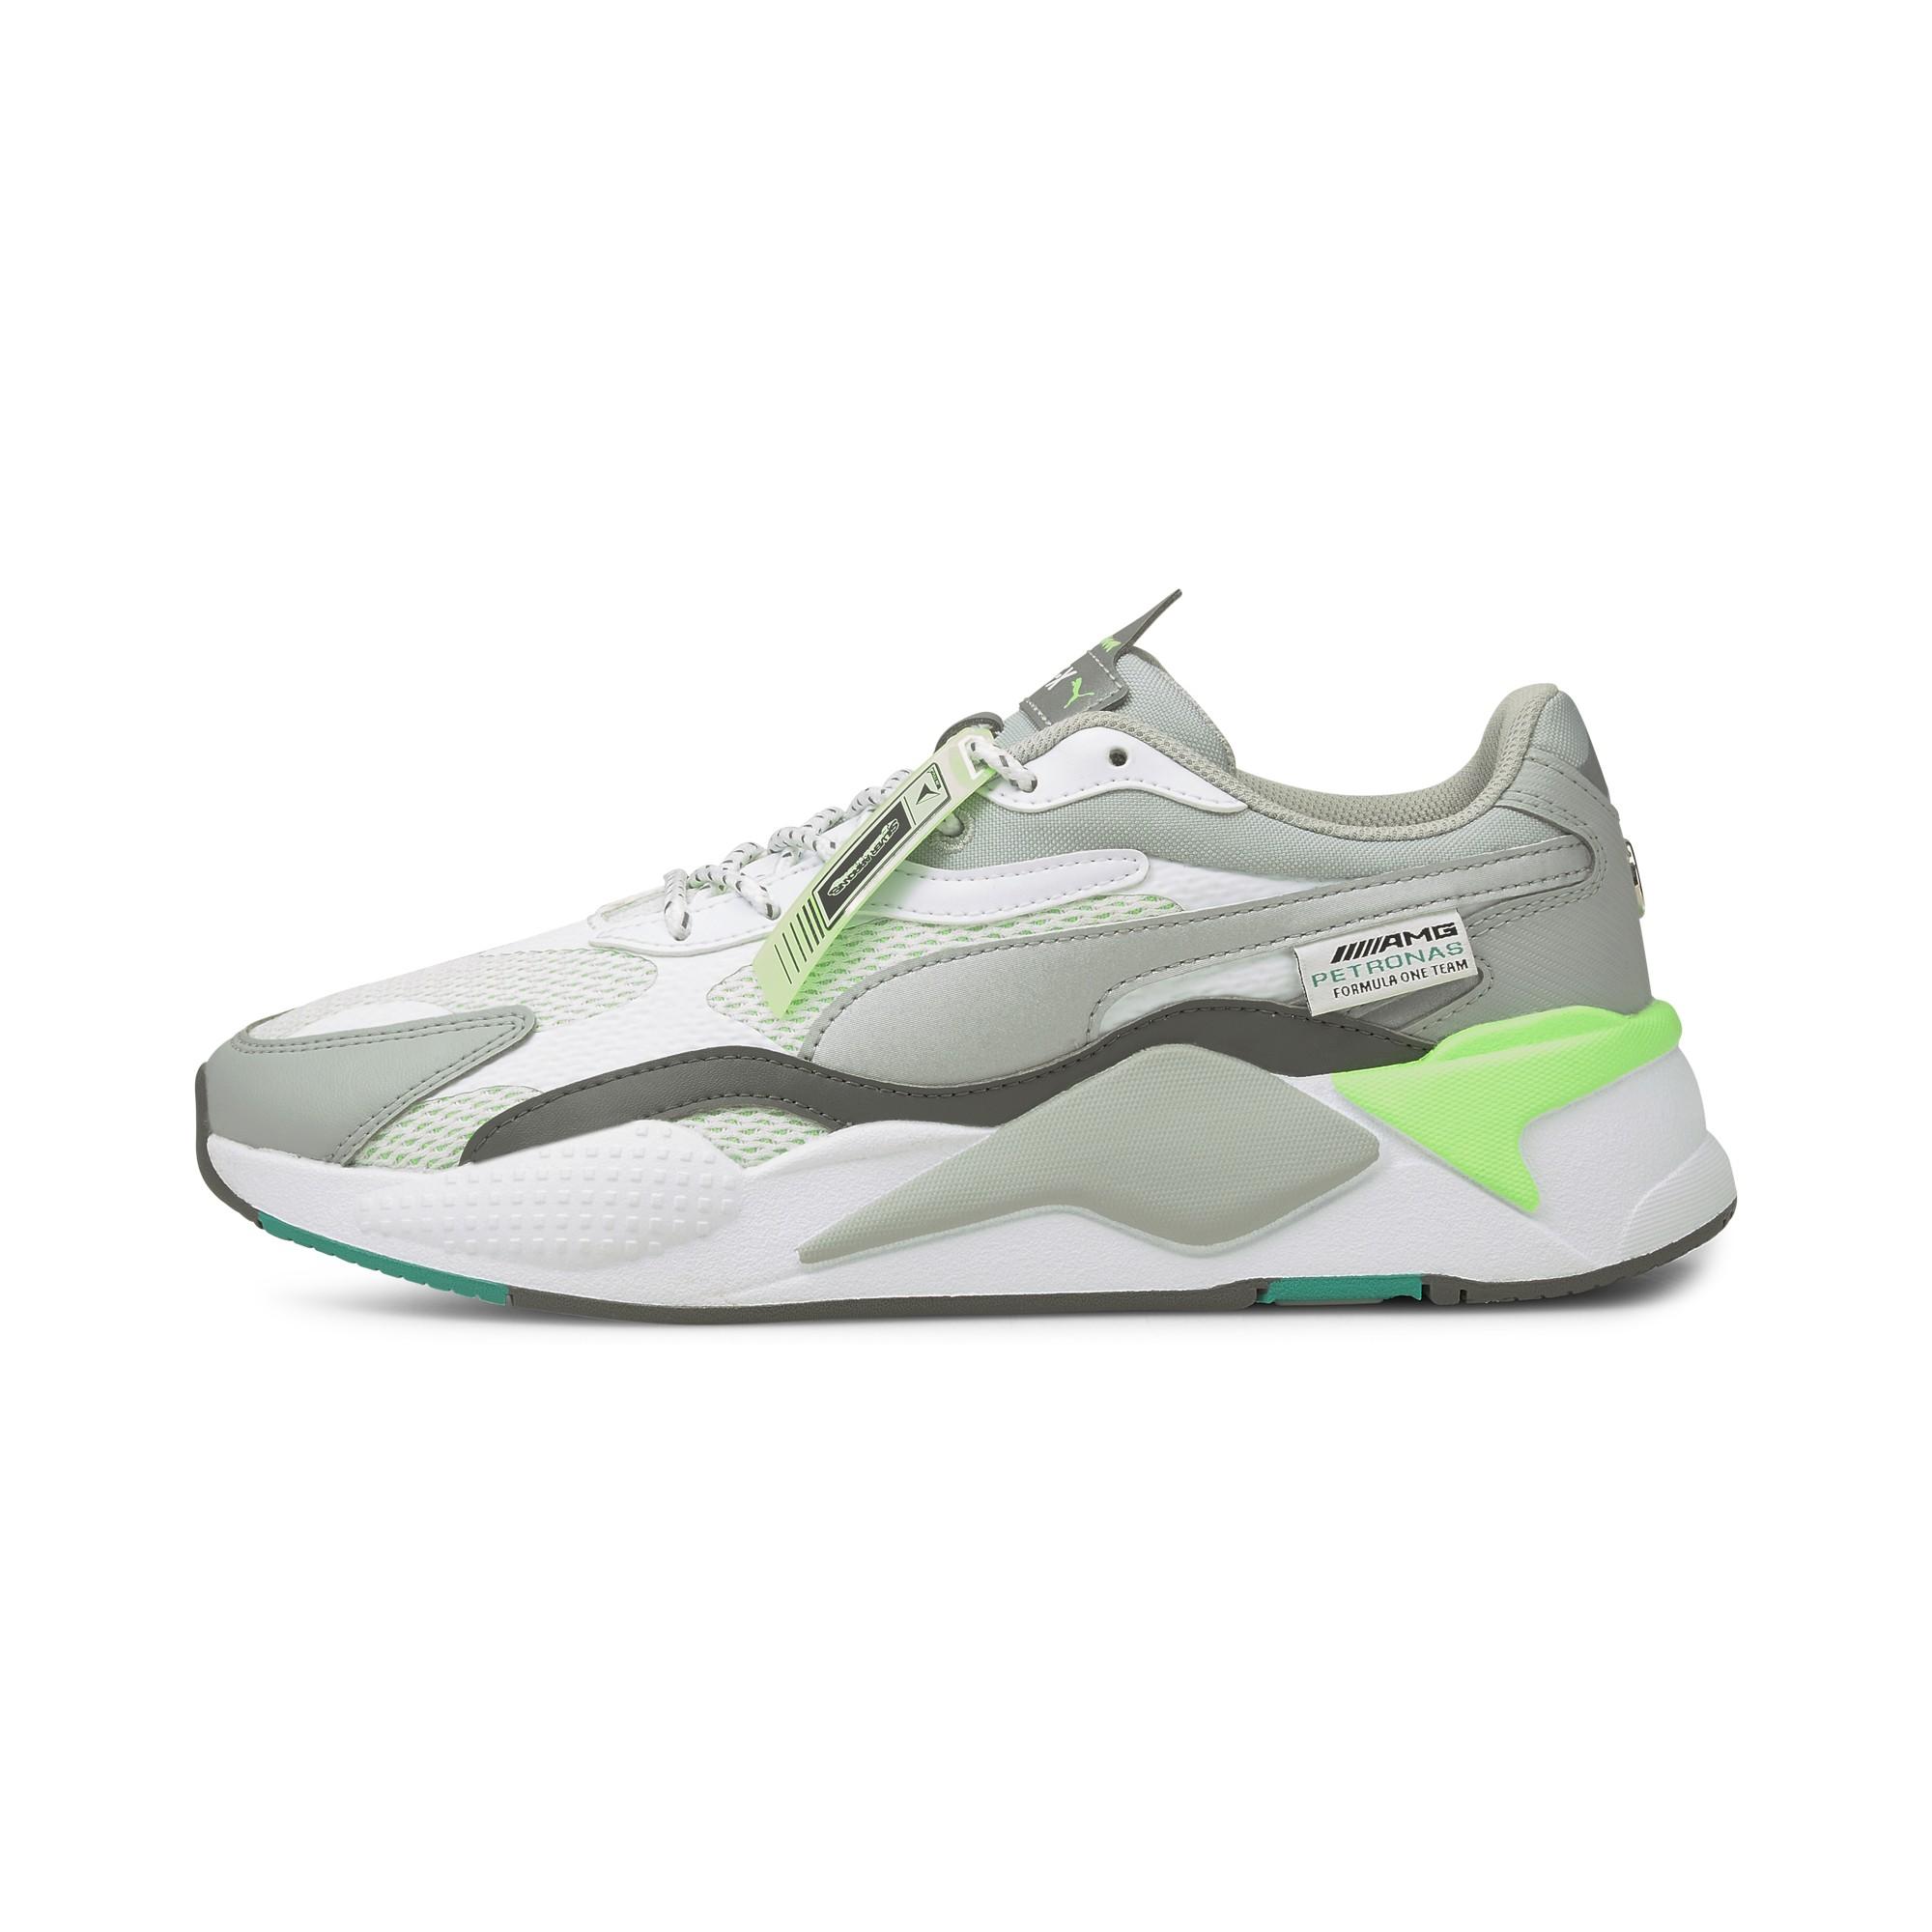 Puma - Fashion Shoes, Mapf1 Rs-X3 - Brands Expert